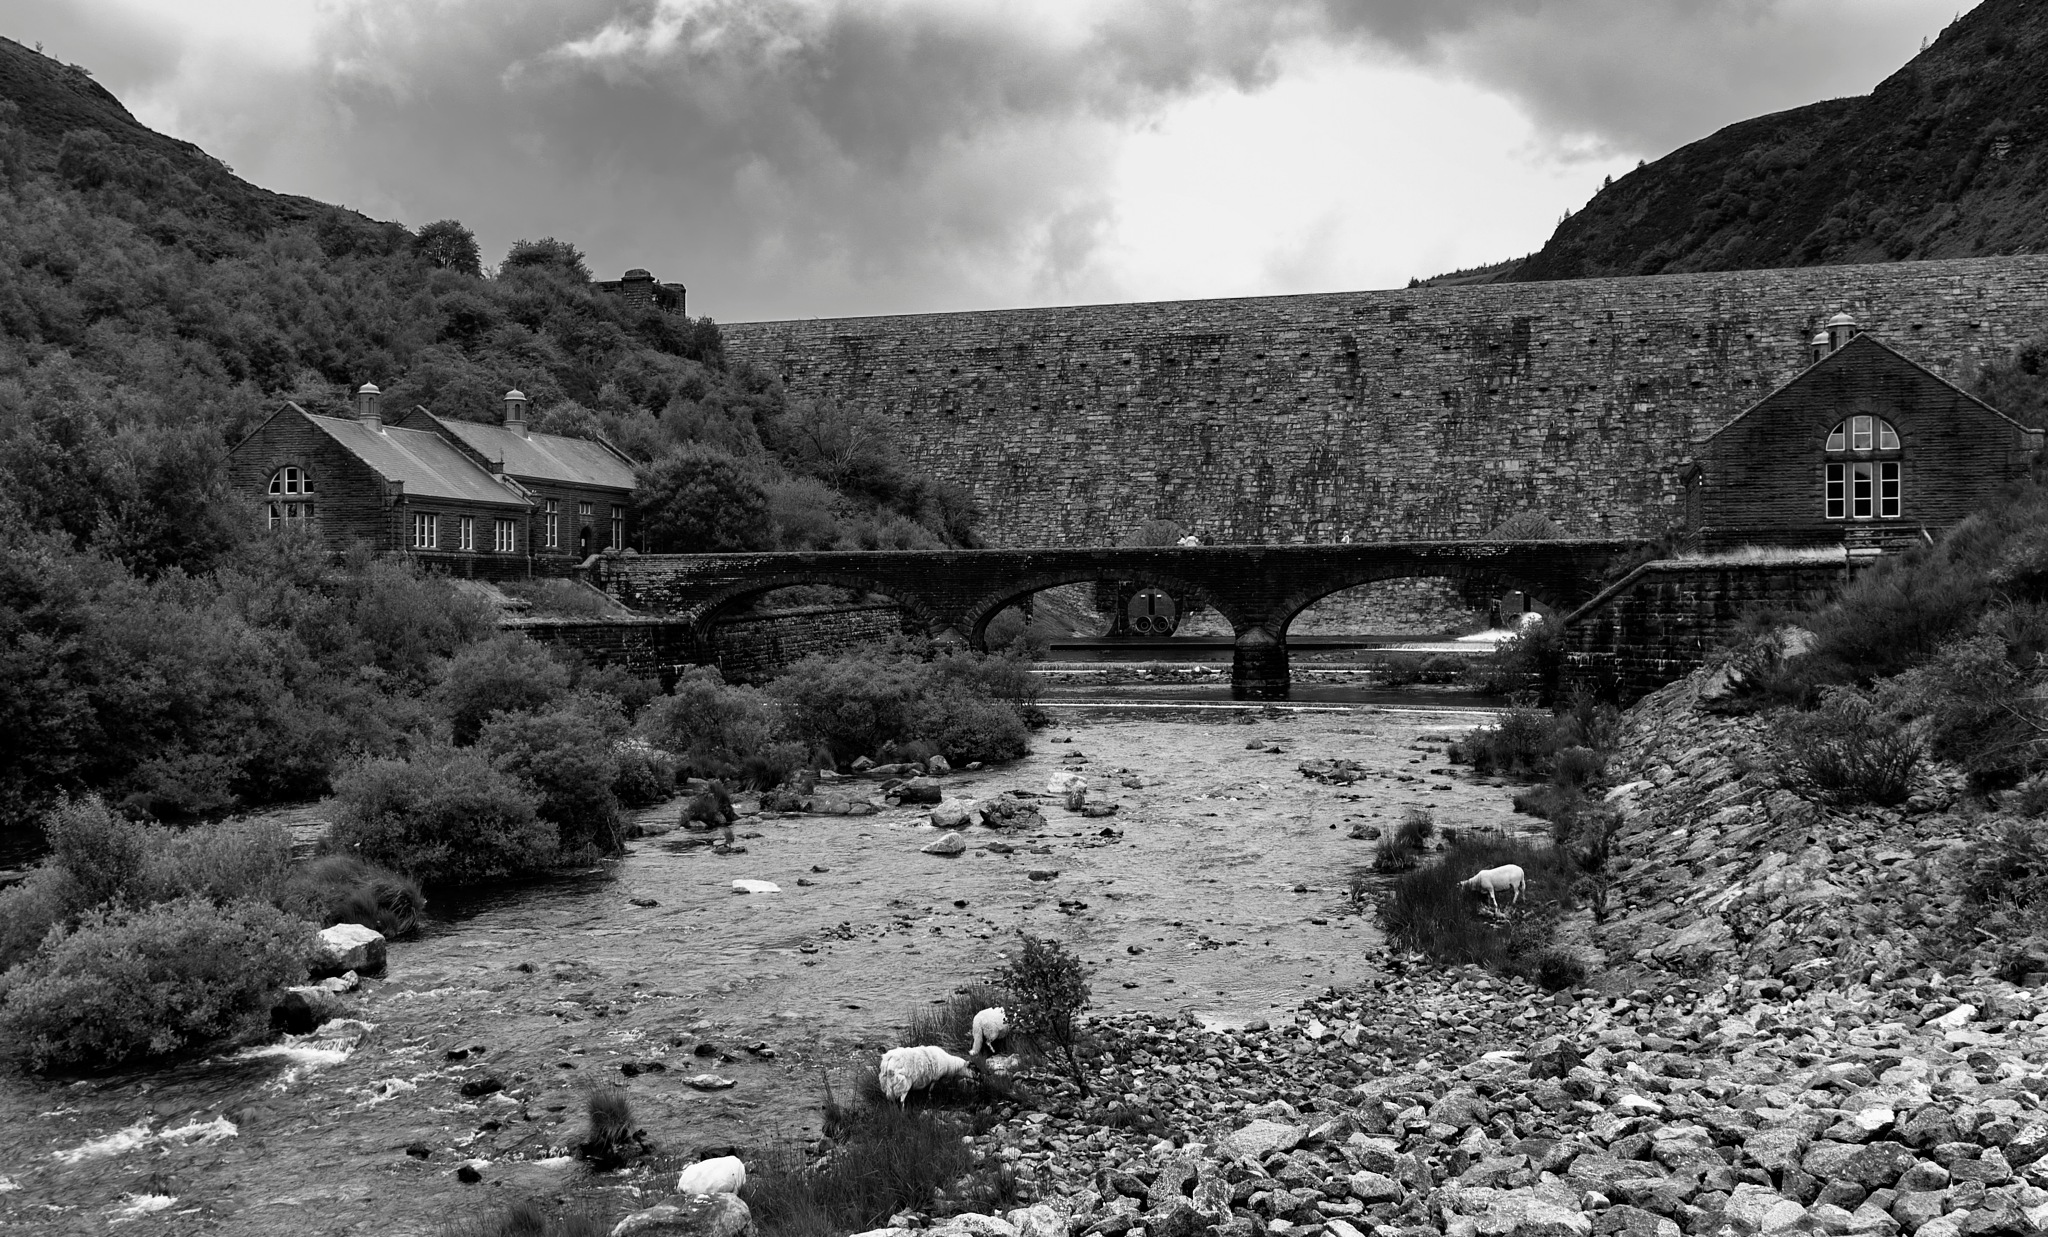 Graig Coch dam, Elan Valley mid Wales by lindans